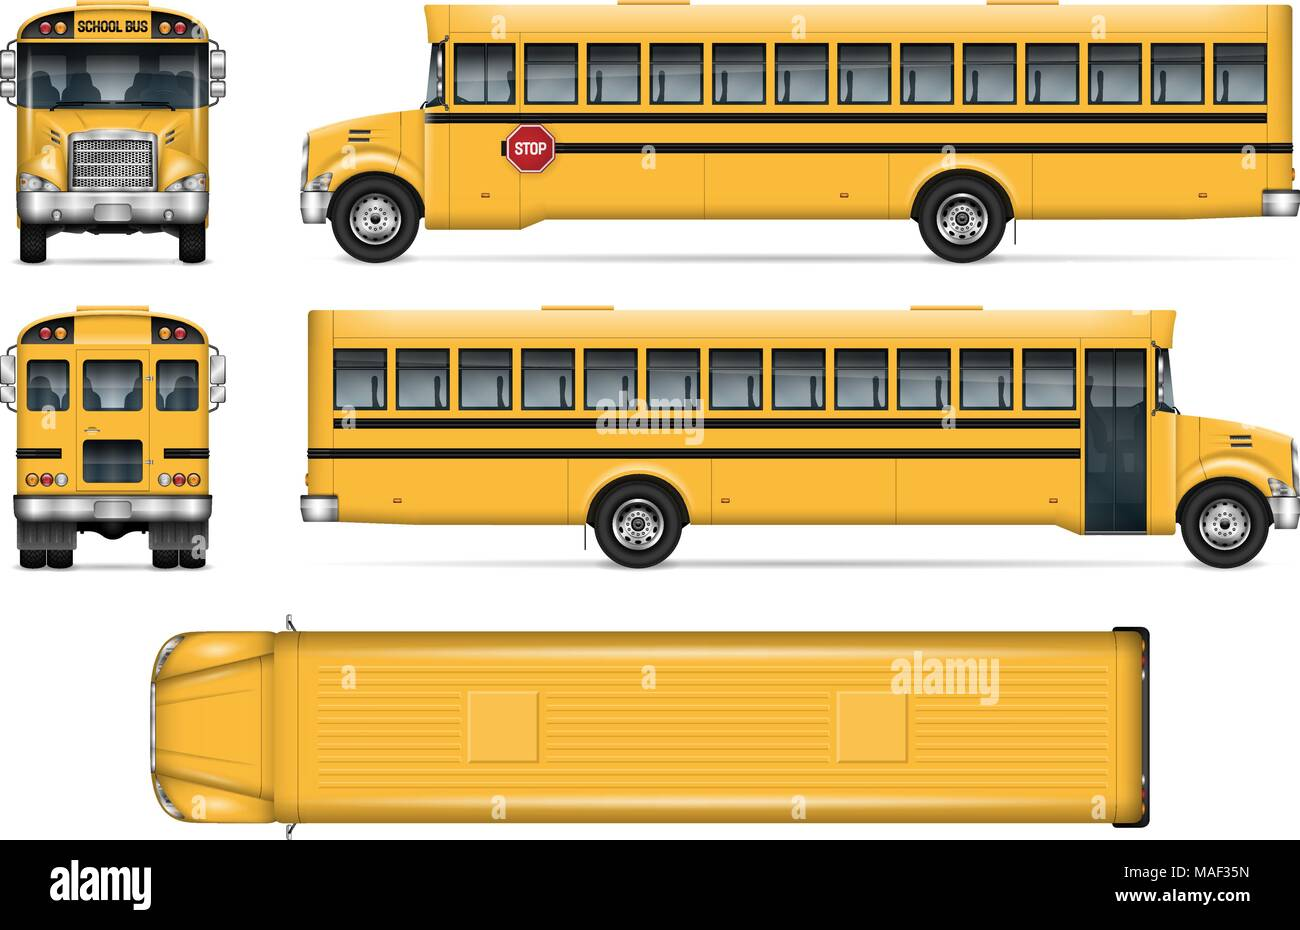 school bus vector mock